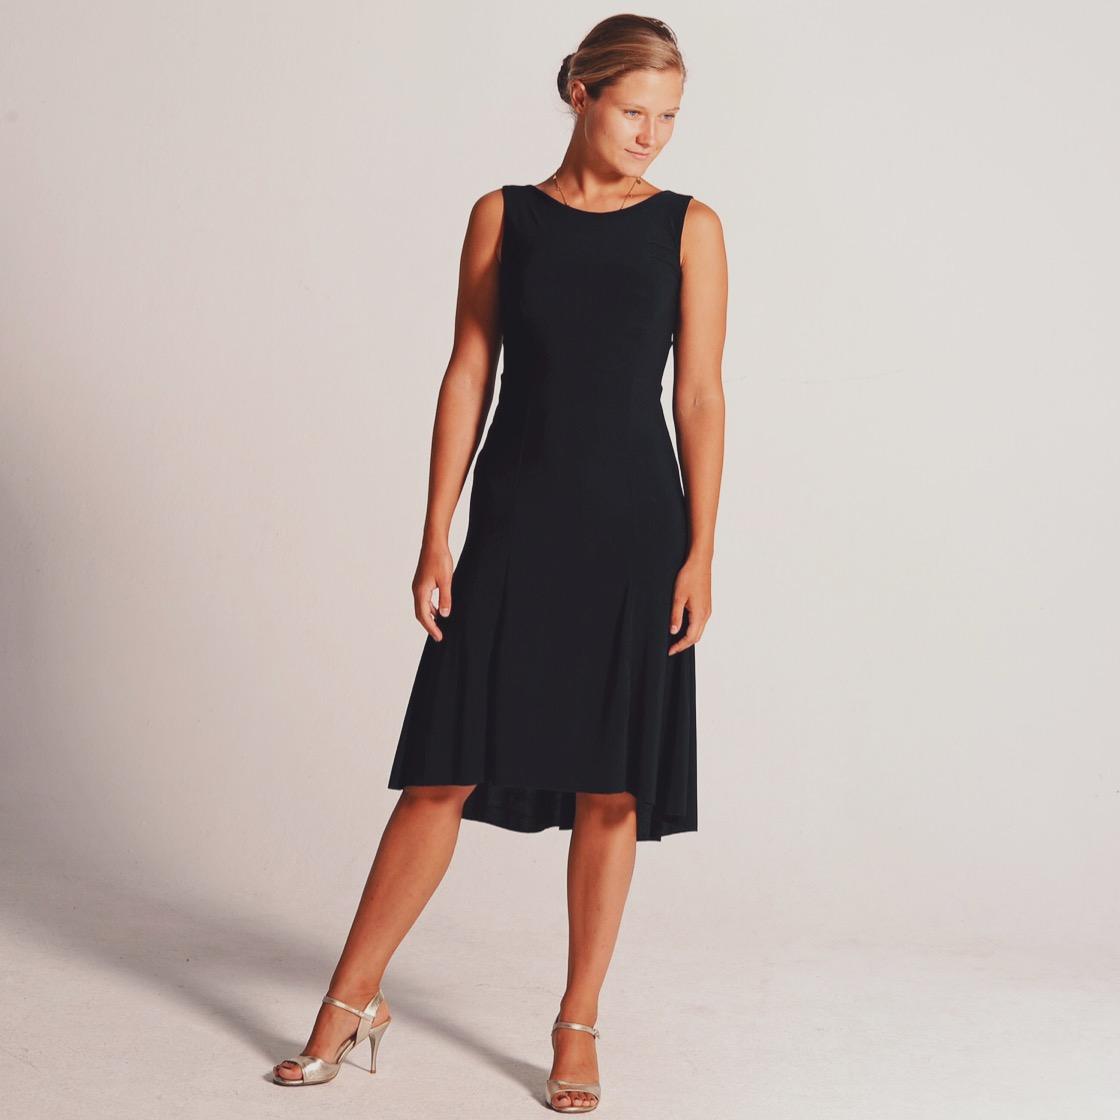 CARLA_black_dress_coleccionberlin.JPG